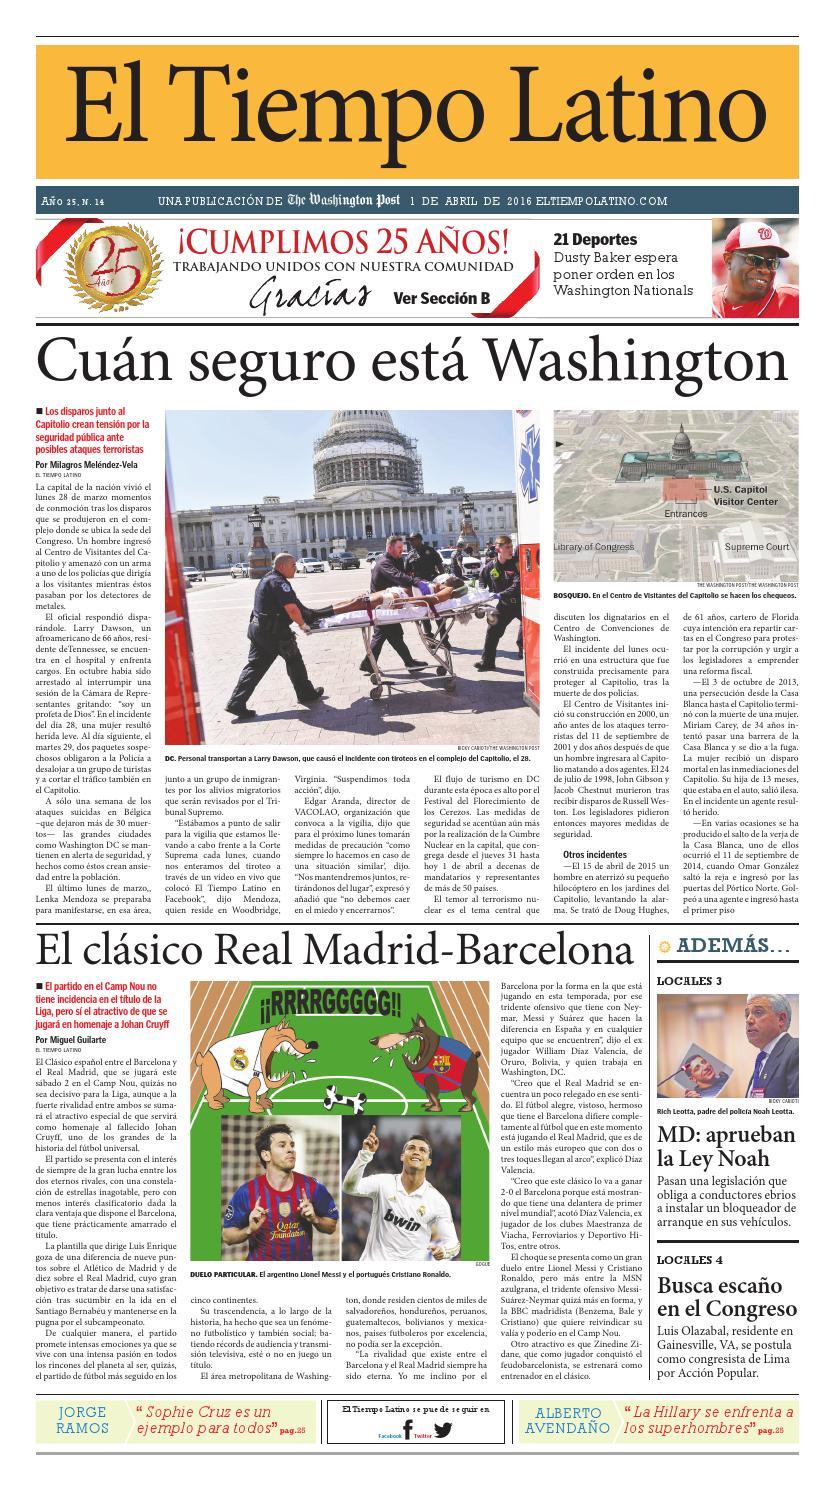 ETL 4-1-16 by El Tiempo Latino /TWP - issuu